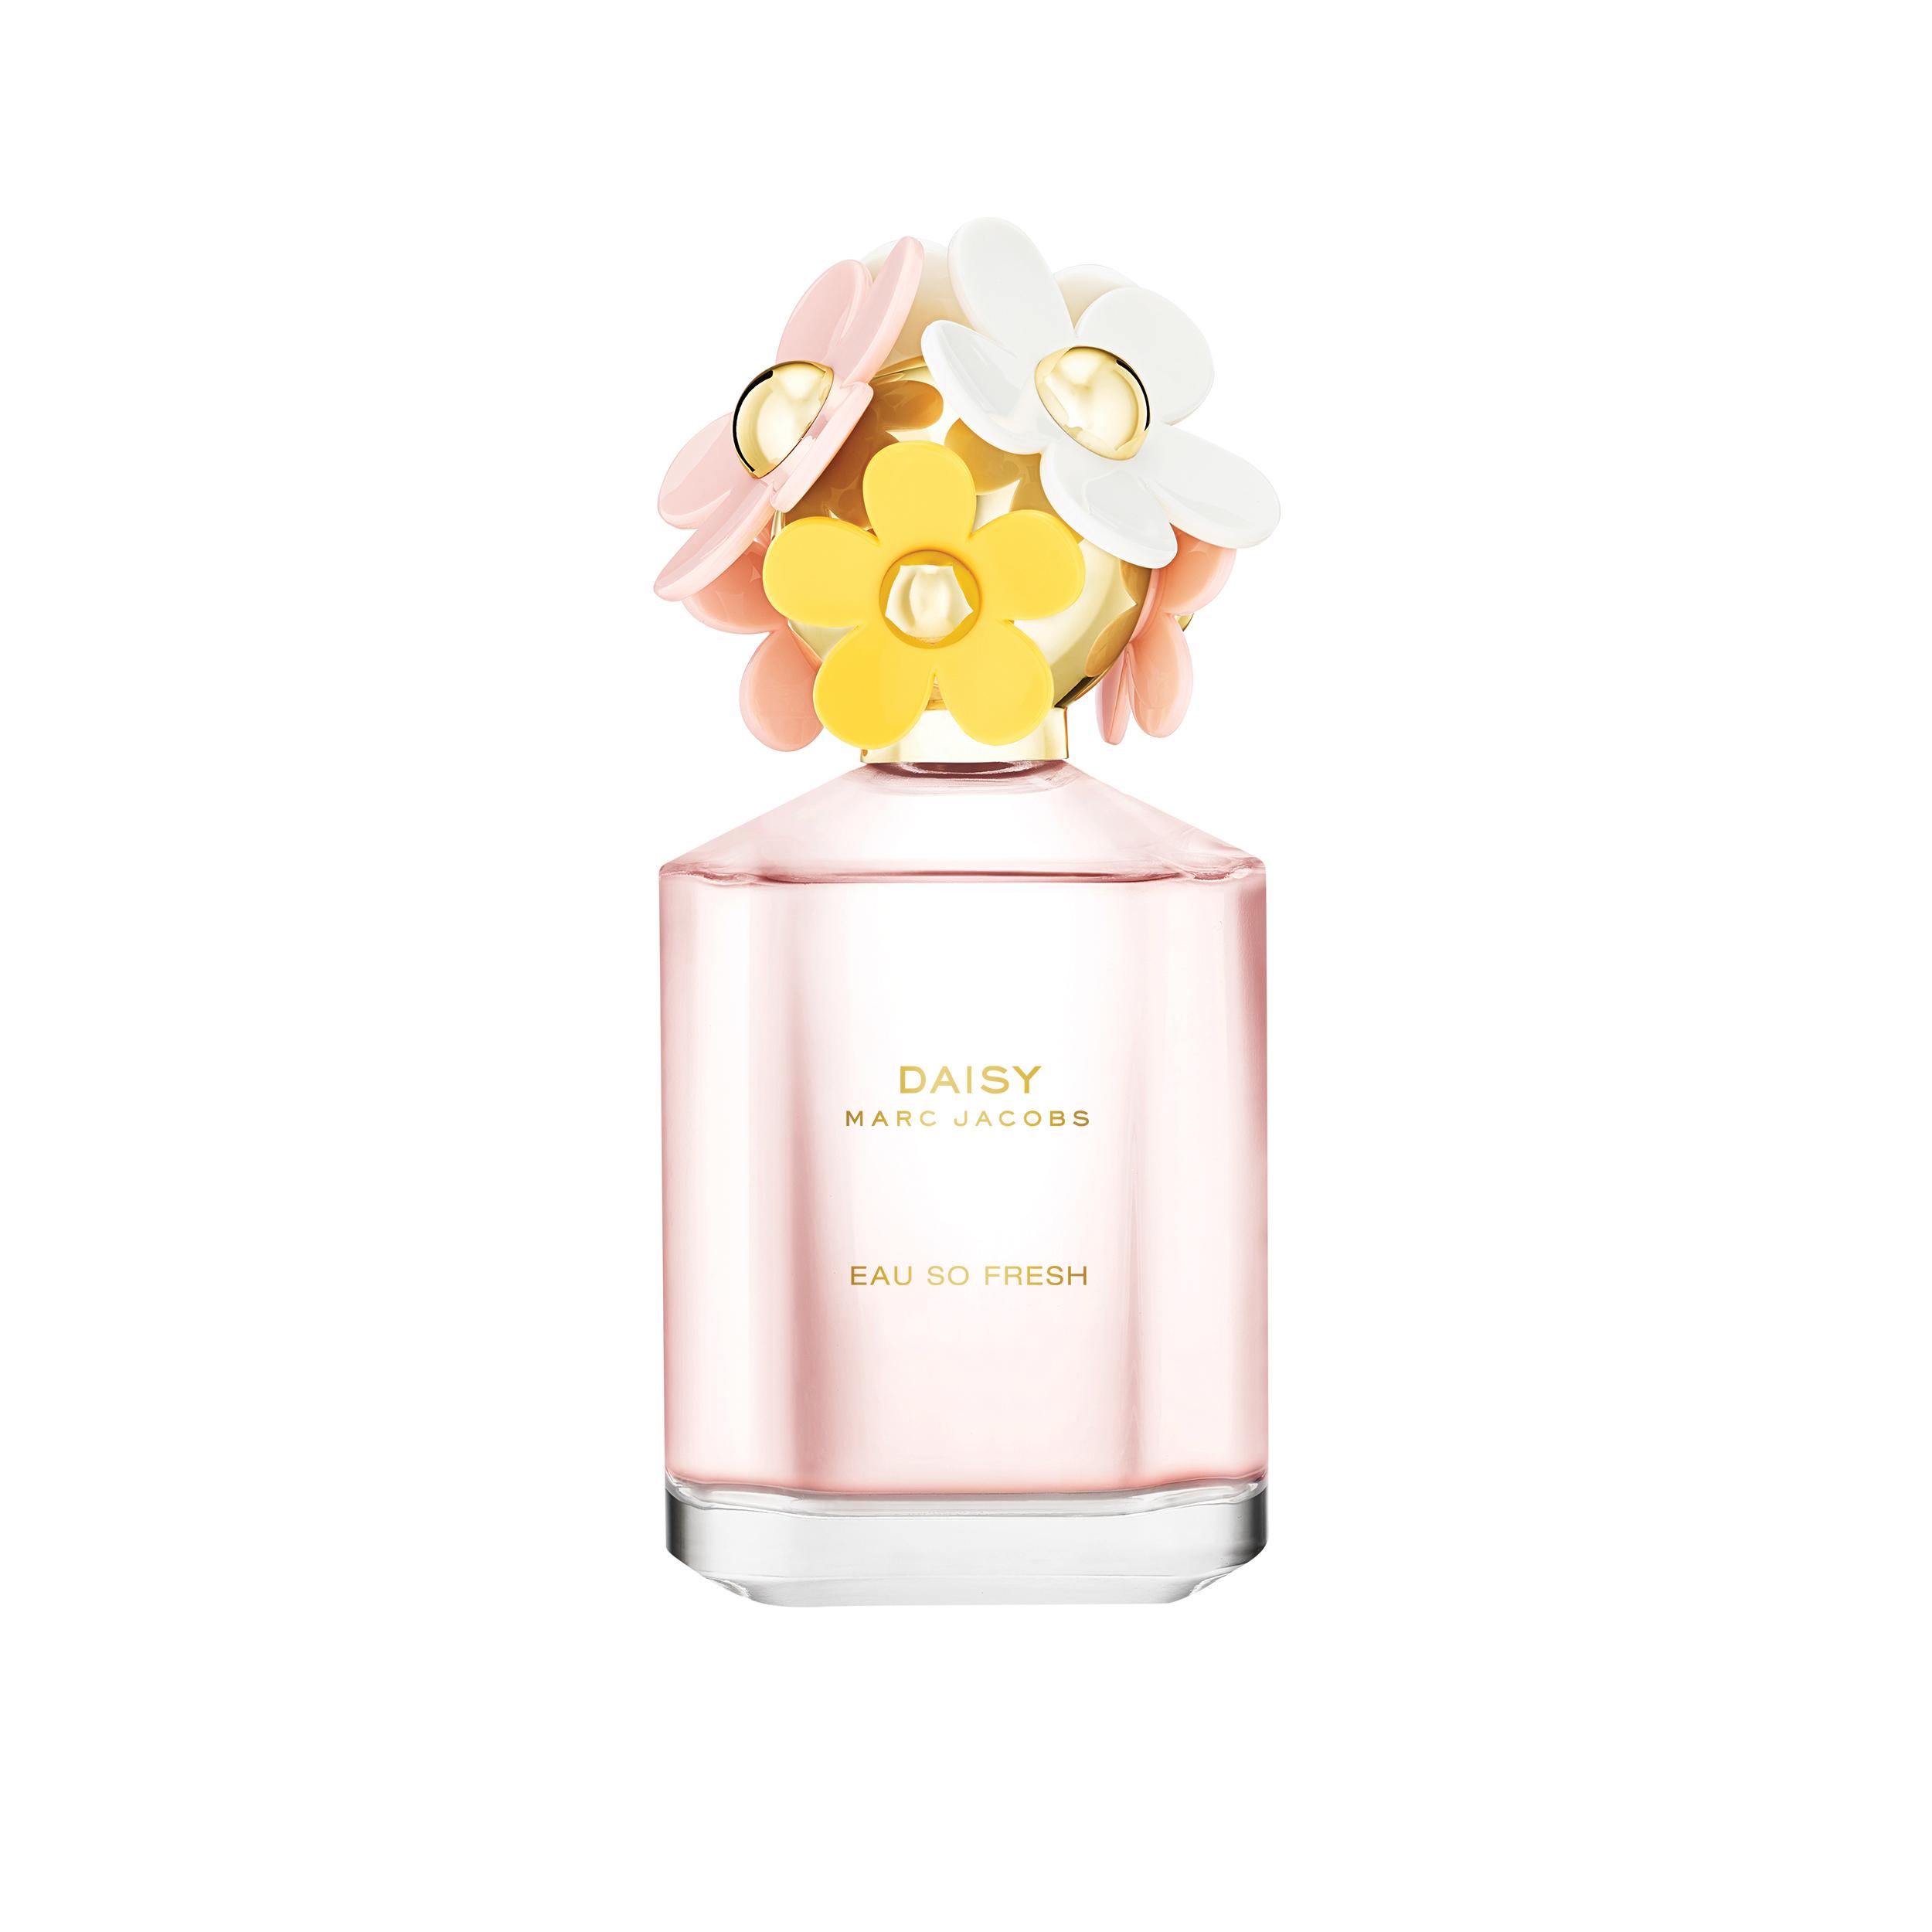 Daisy Eau Fresh EdT, 20 ml Parfym & EdT Köp online på